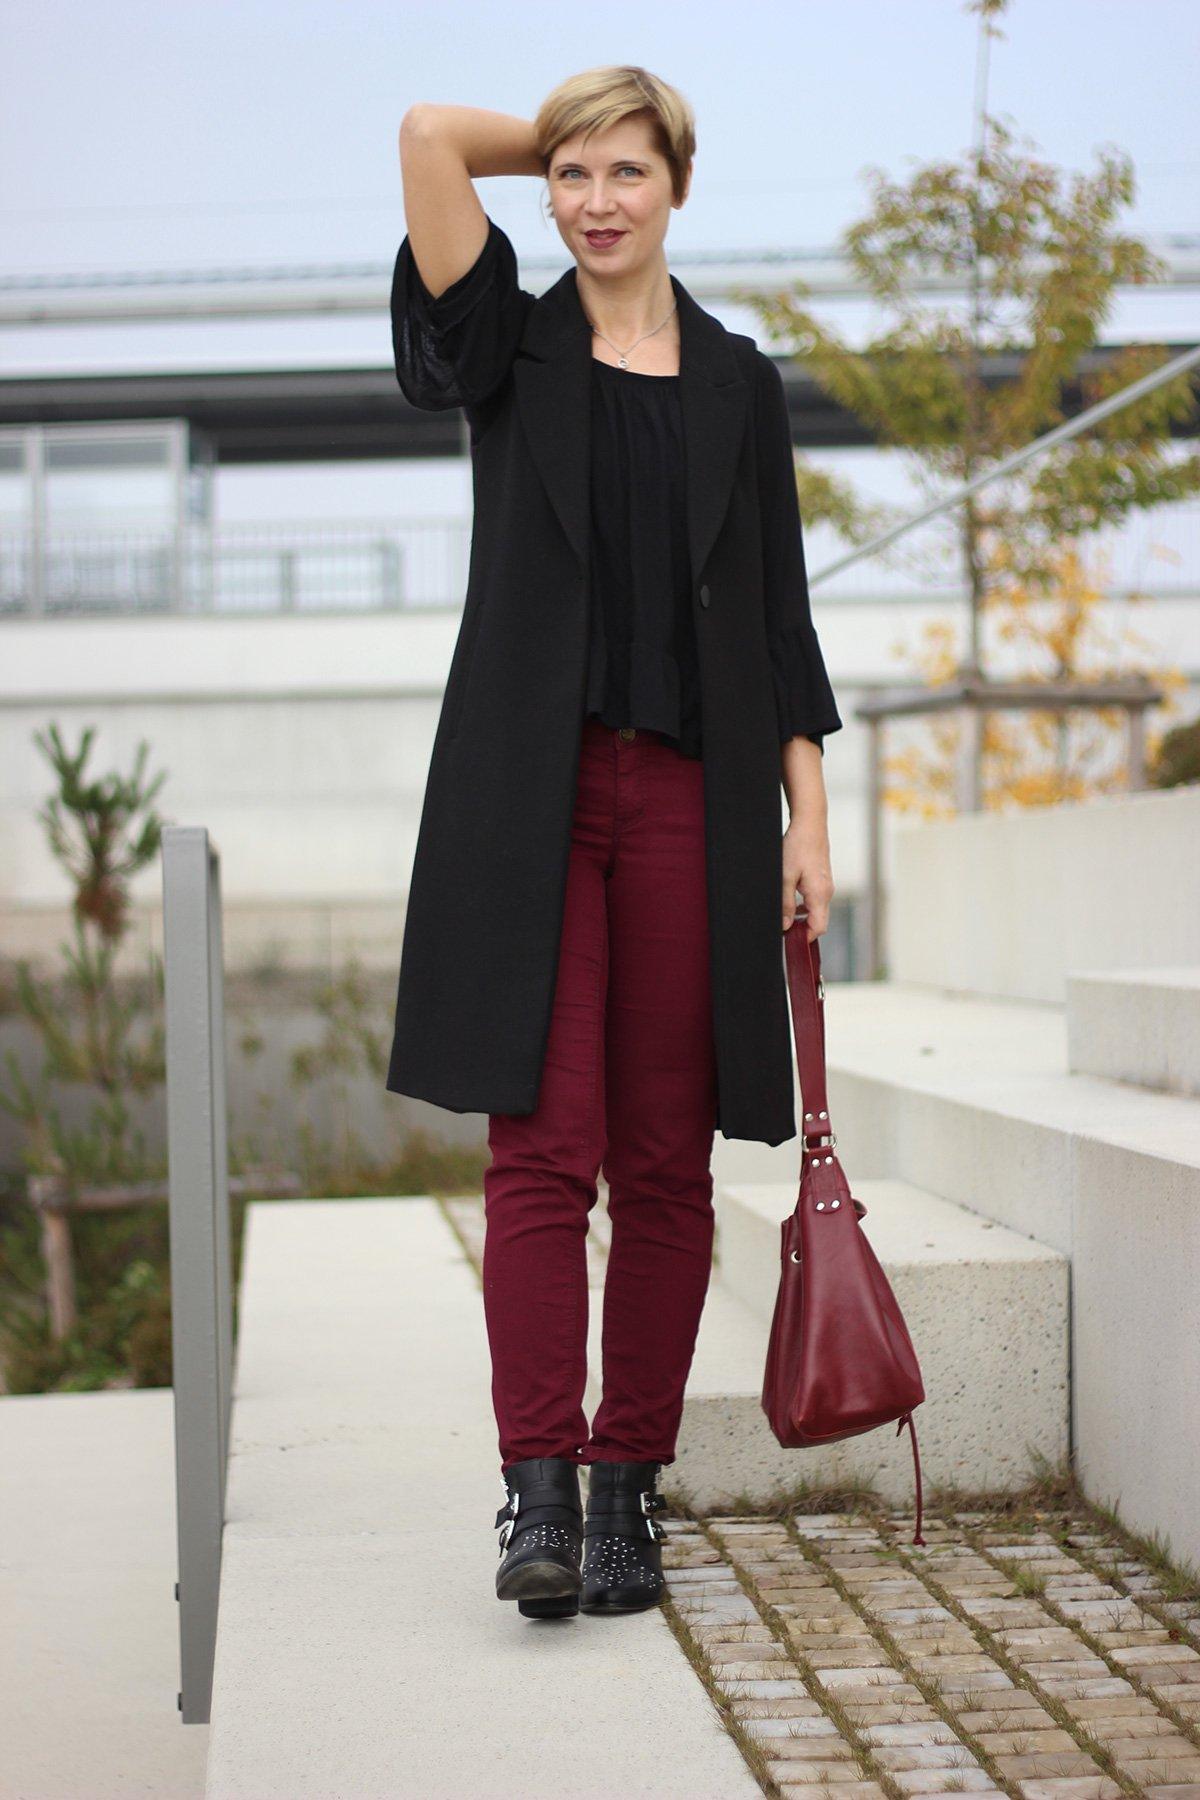 Burgunder, Herbstlook, lange Weste, Long vest, WENZ, Only, Nietenschuhe, Mango-Shirt, Conny Doll, Fashionblog